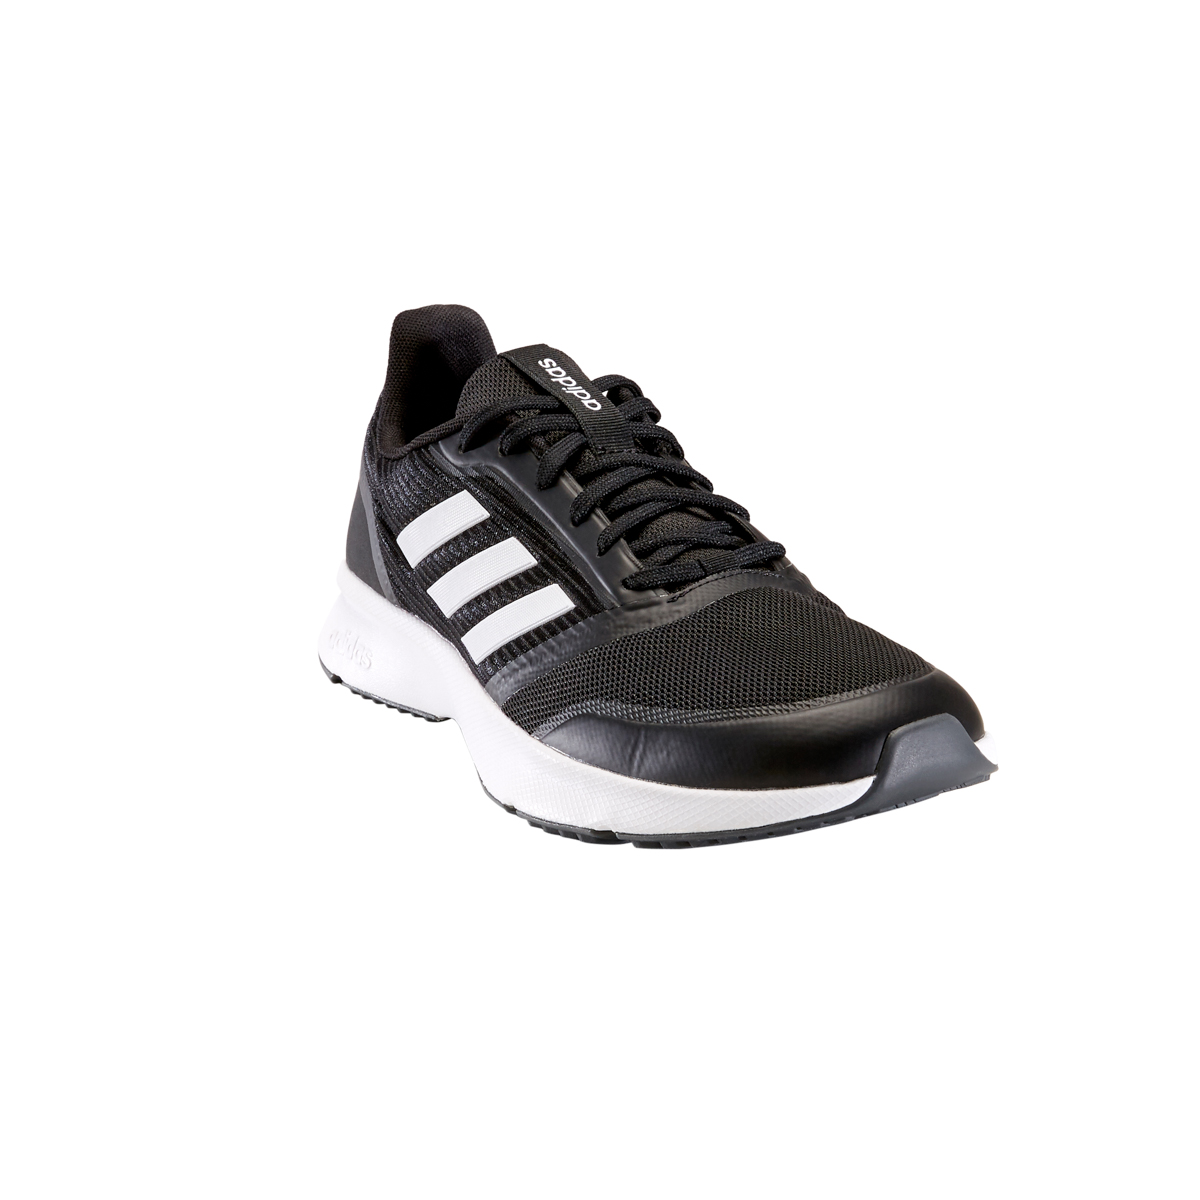 Adidas Nova Men's Fitness Walking Shoes